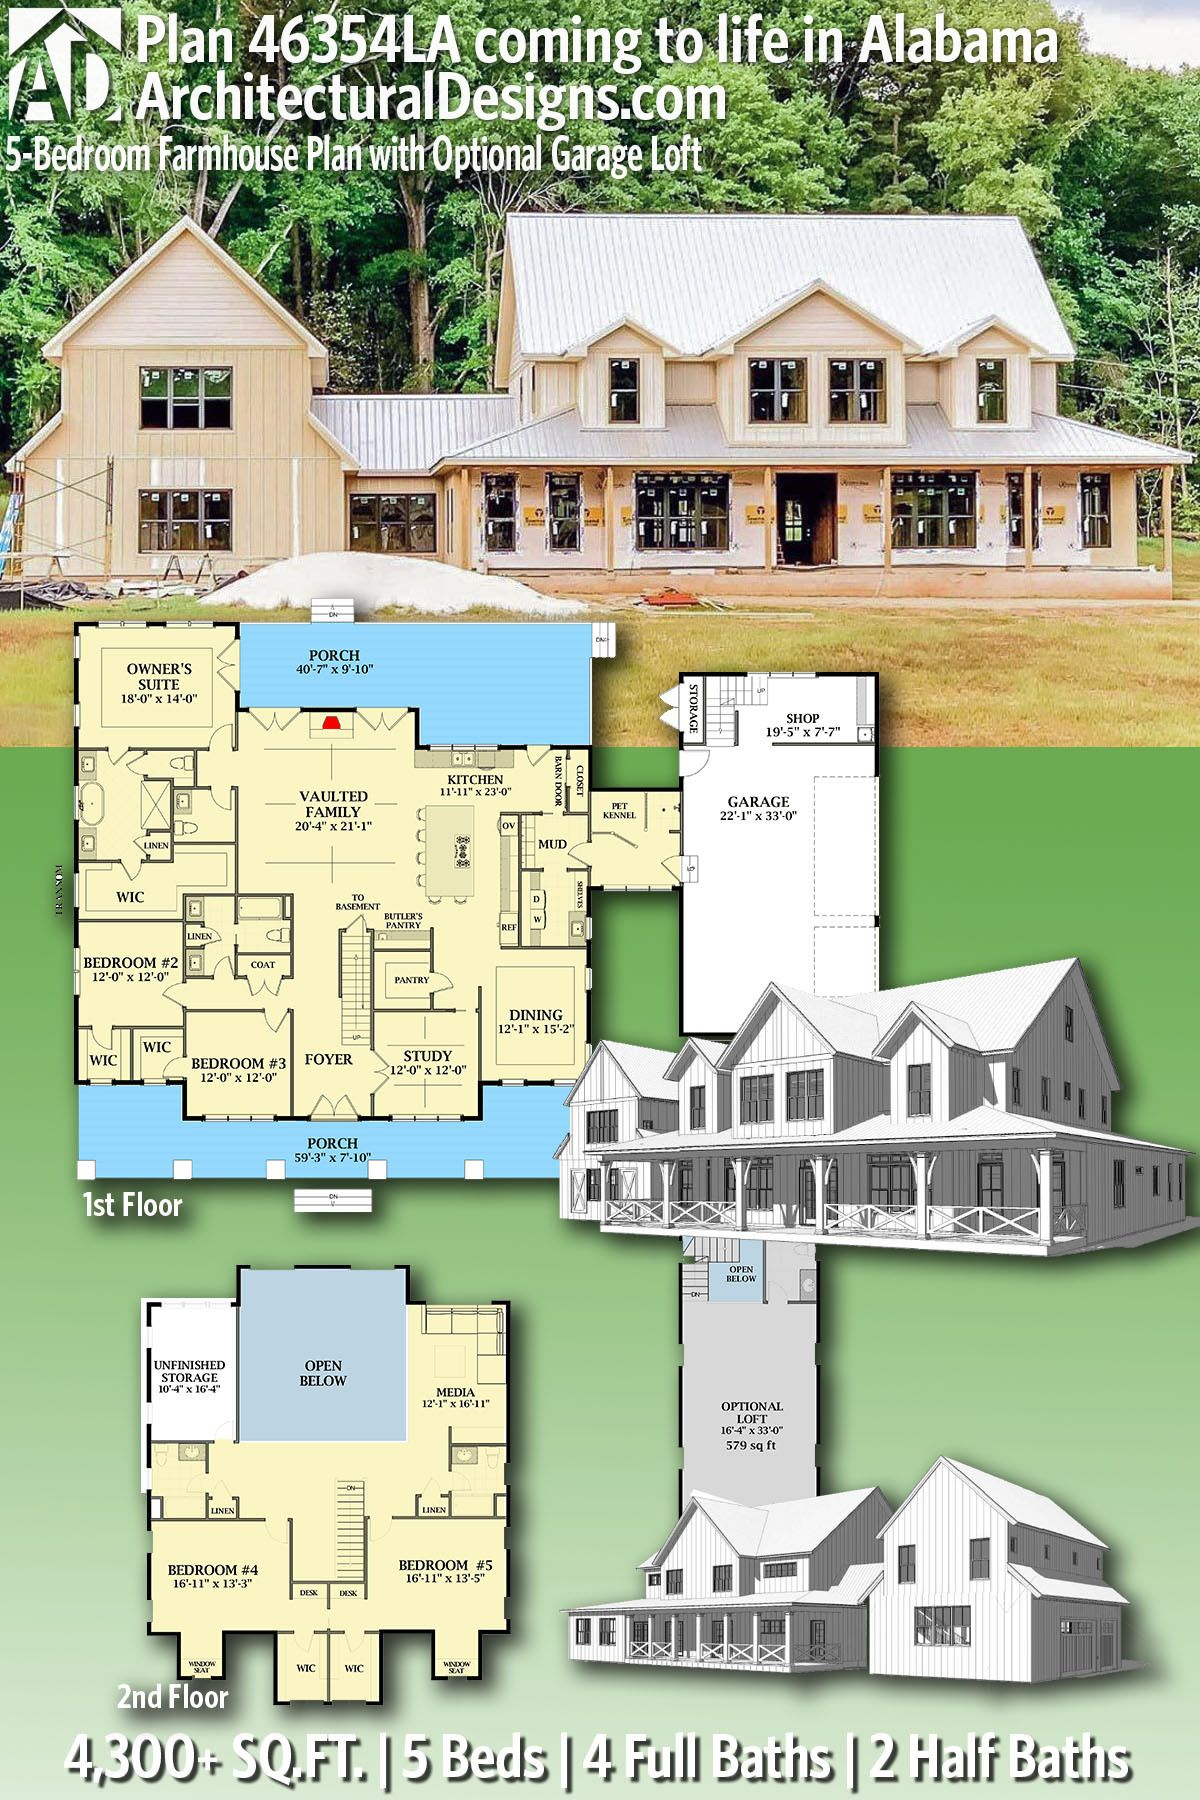 Plan 46354la 5 Bedroom Farmhouse Plan With Optional Garage Loft House Plans Farmhouse Farmhouse Plans House Plans